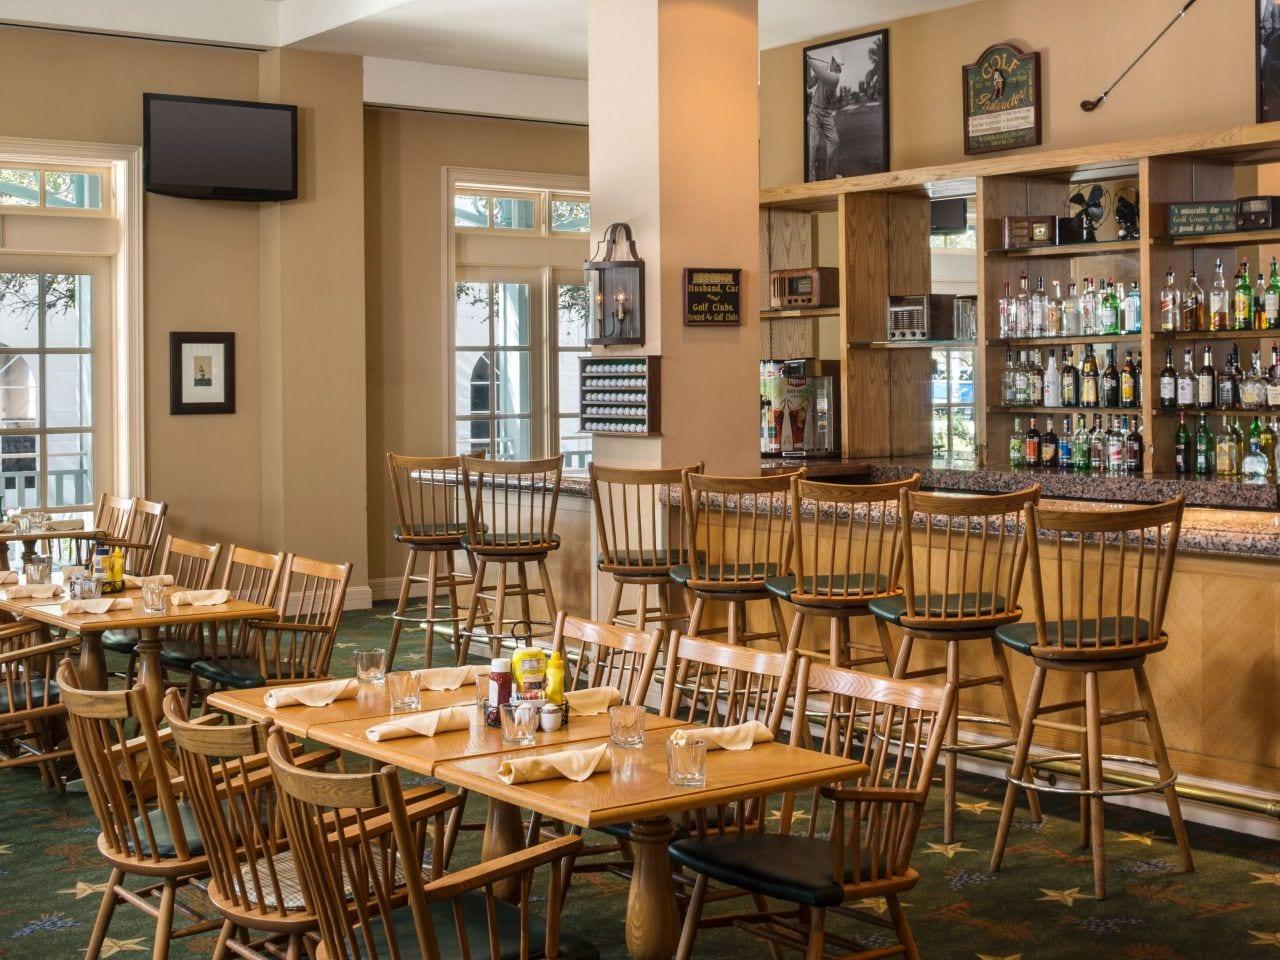 Cactus Oak Bar Hyatt Regency Hill Country Resort and Spa